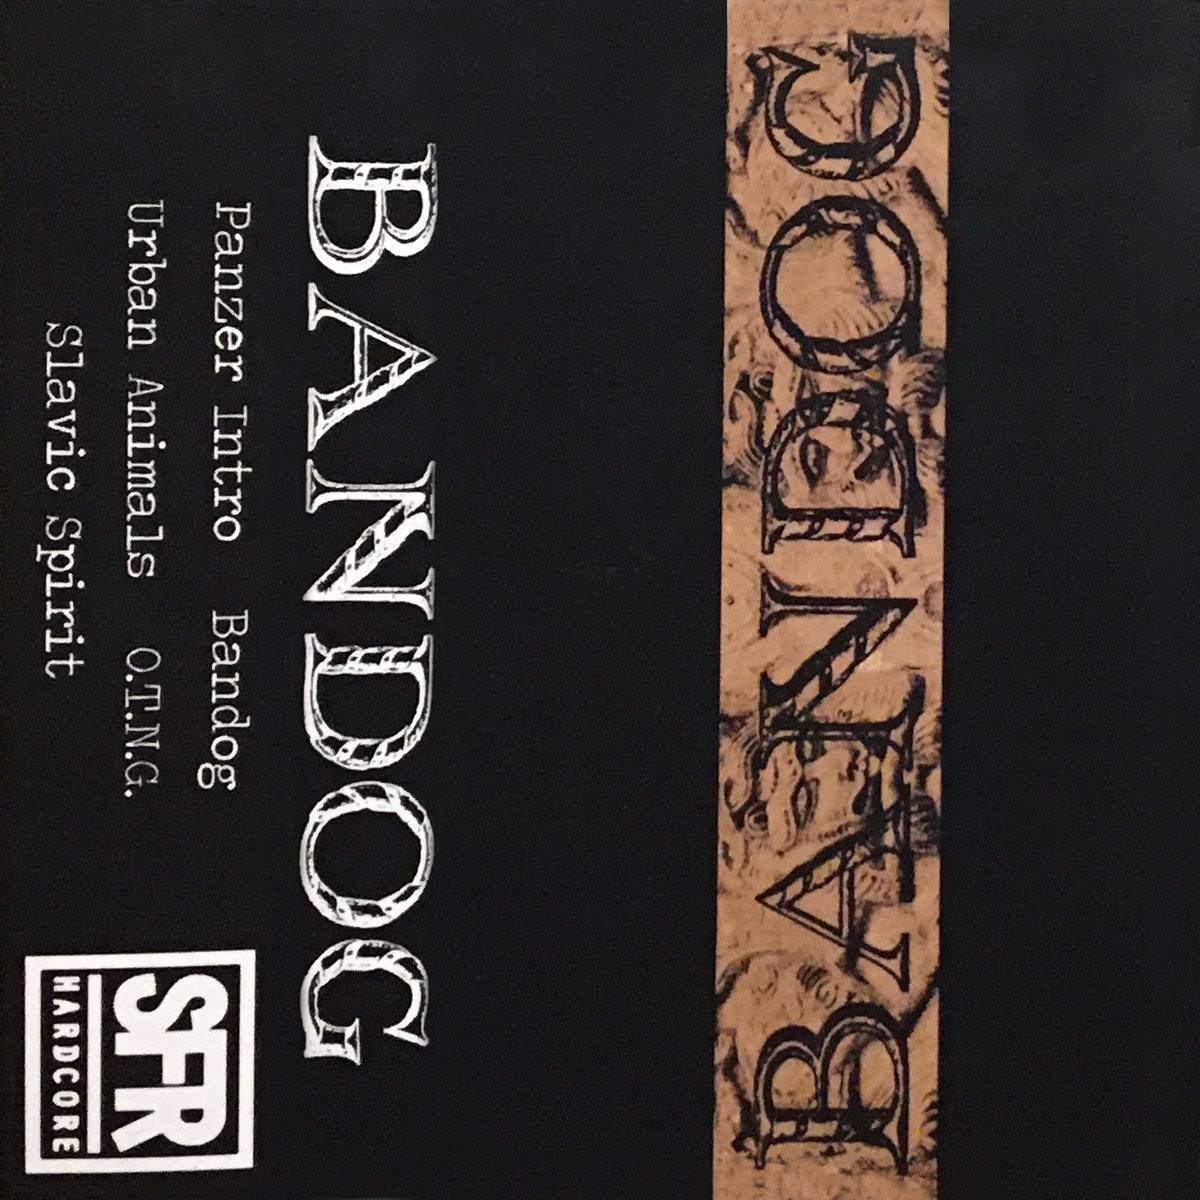 Bandog - demo - Tape